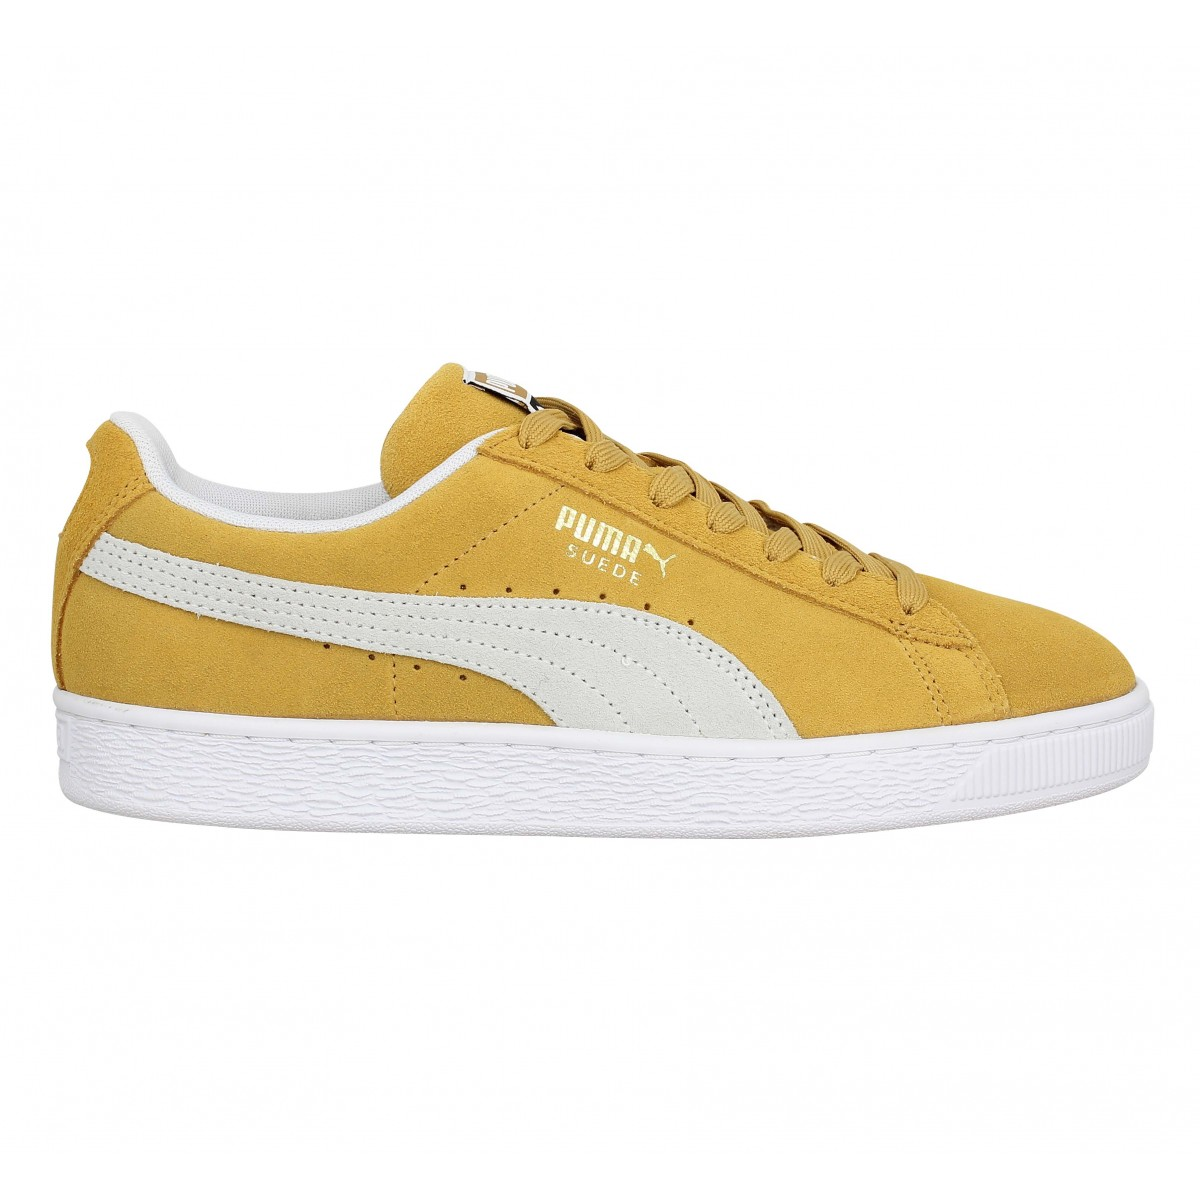 Classic Velours Puma Suede Chaussures Homme MoutardeFanny cAjRL435q